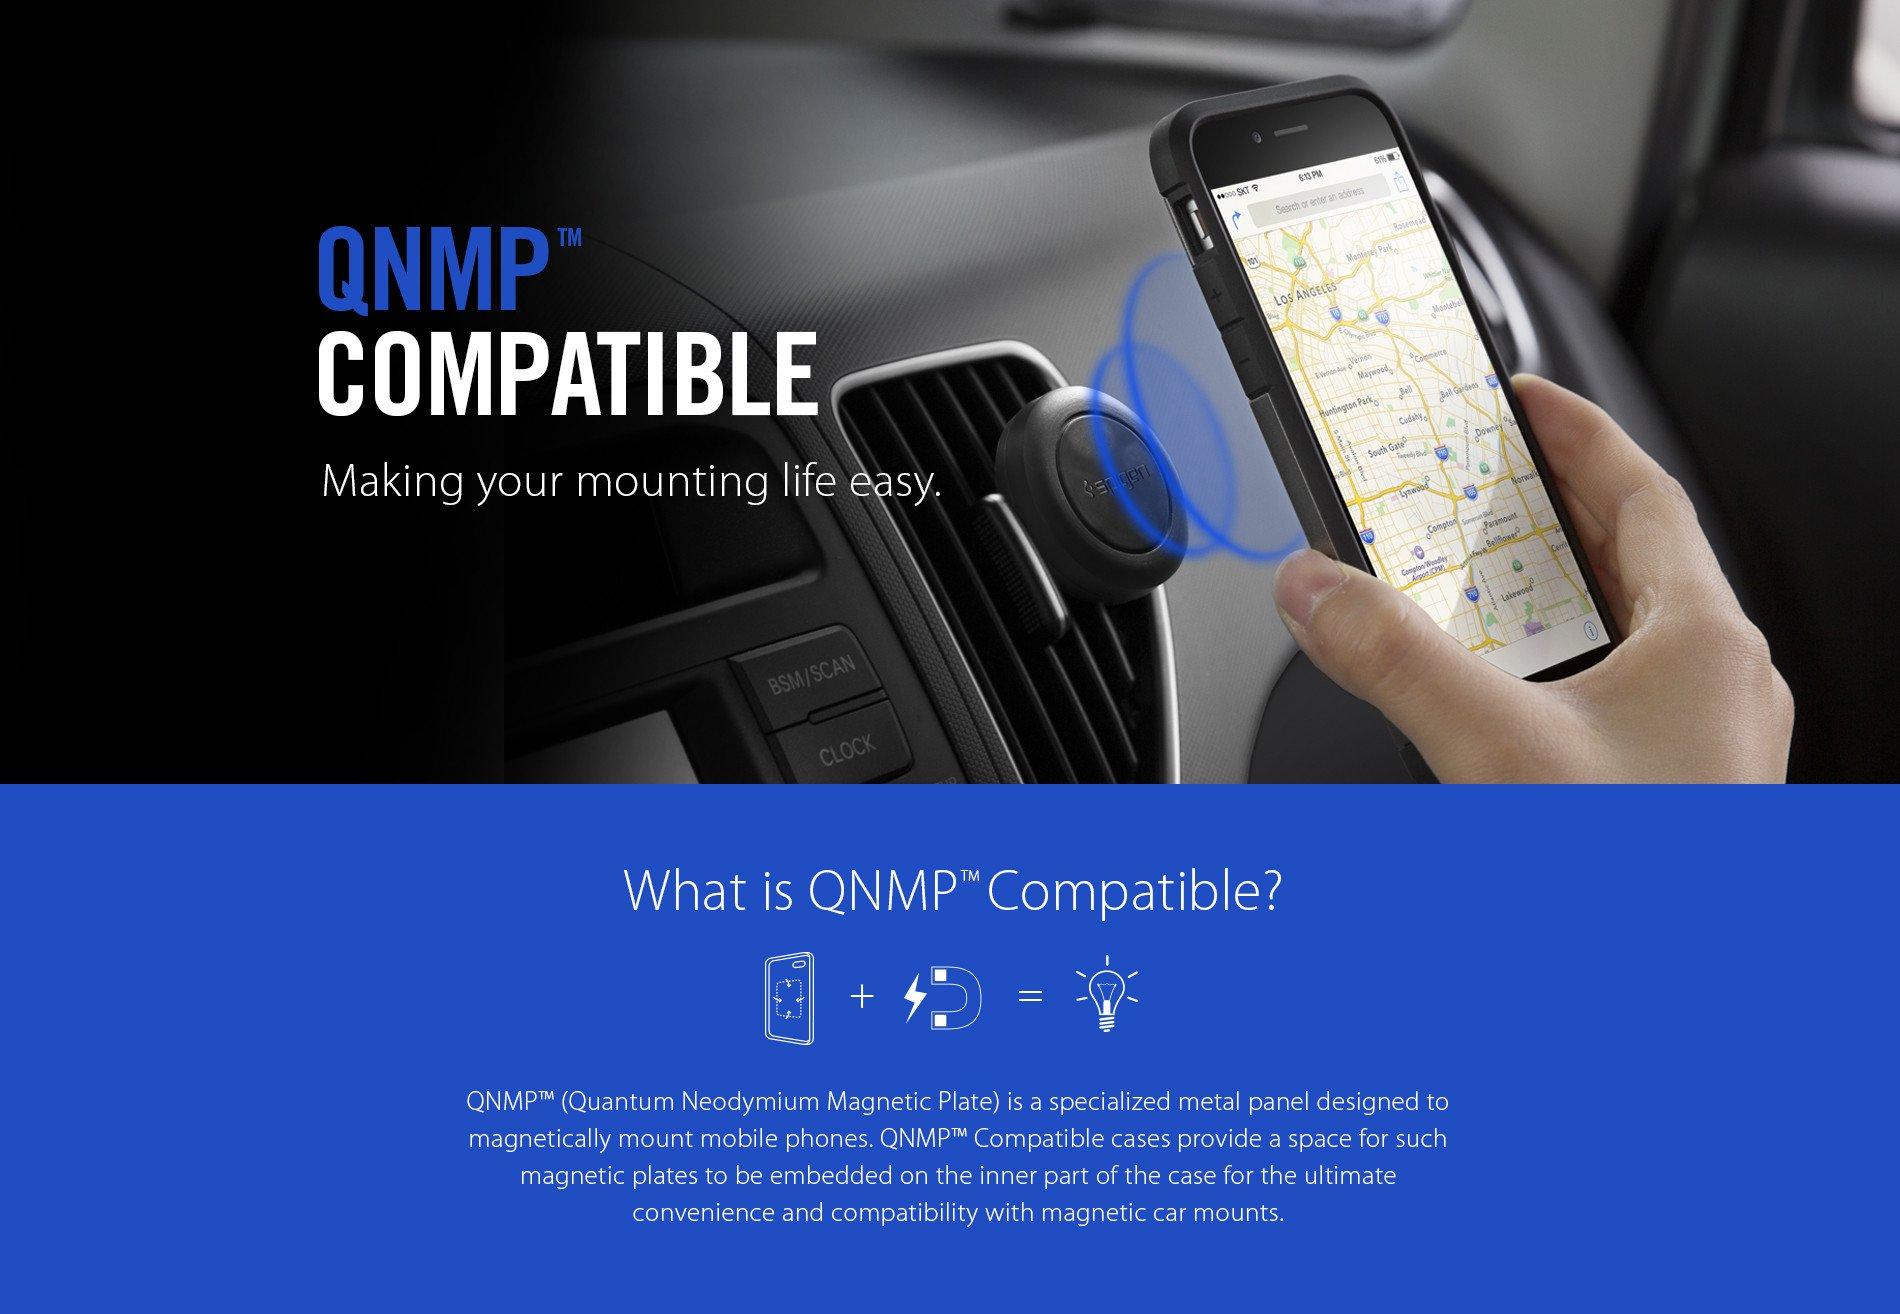 qnmp compatible là gì?